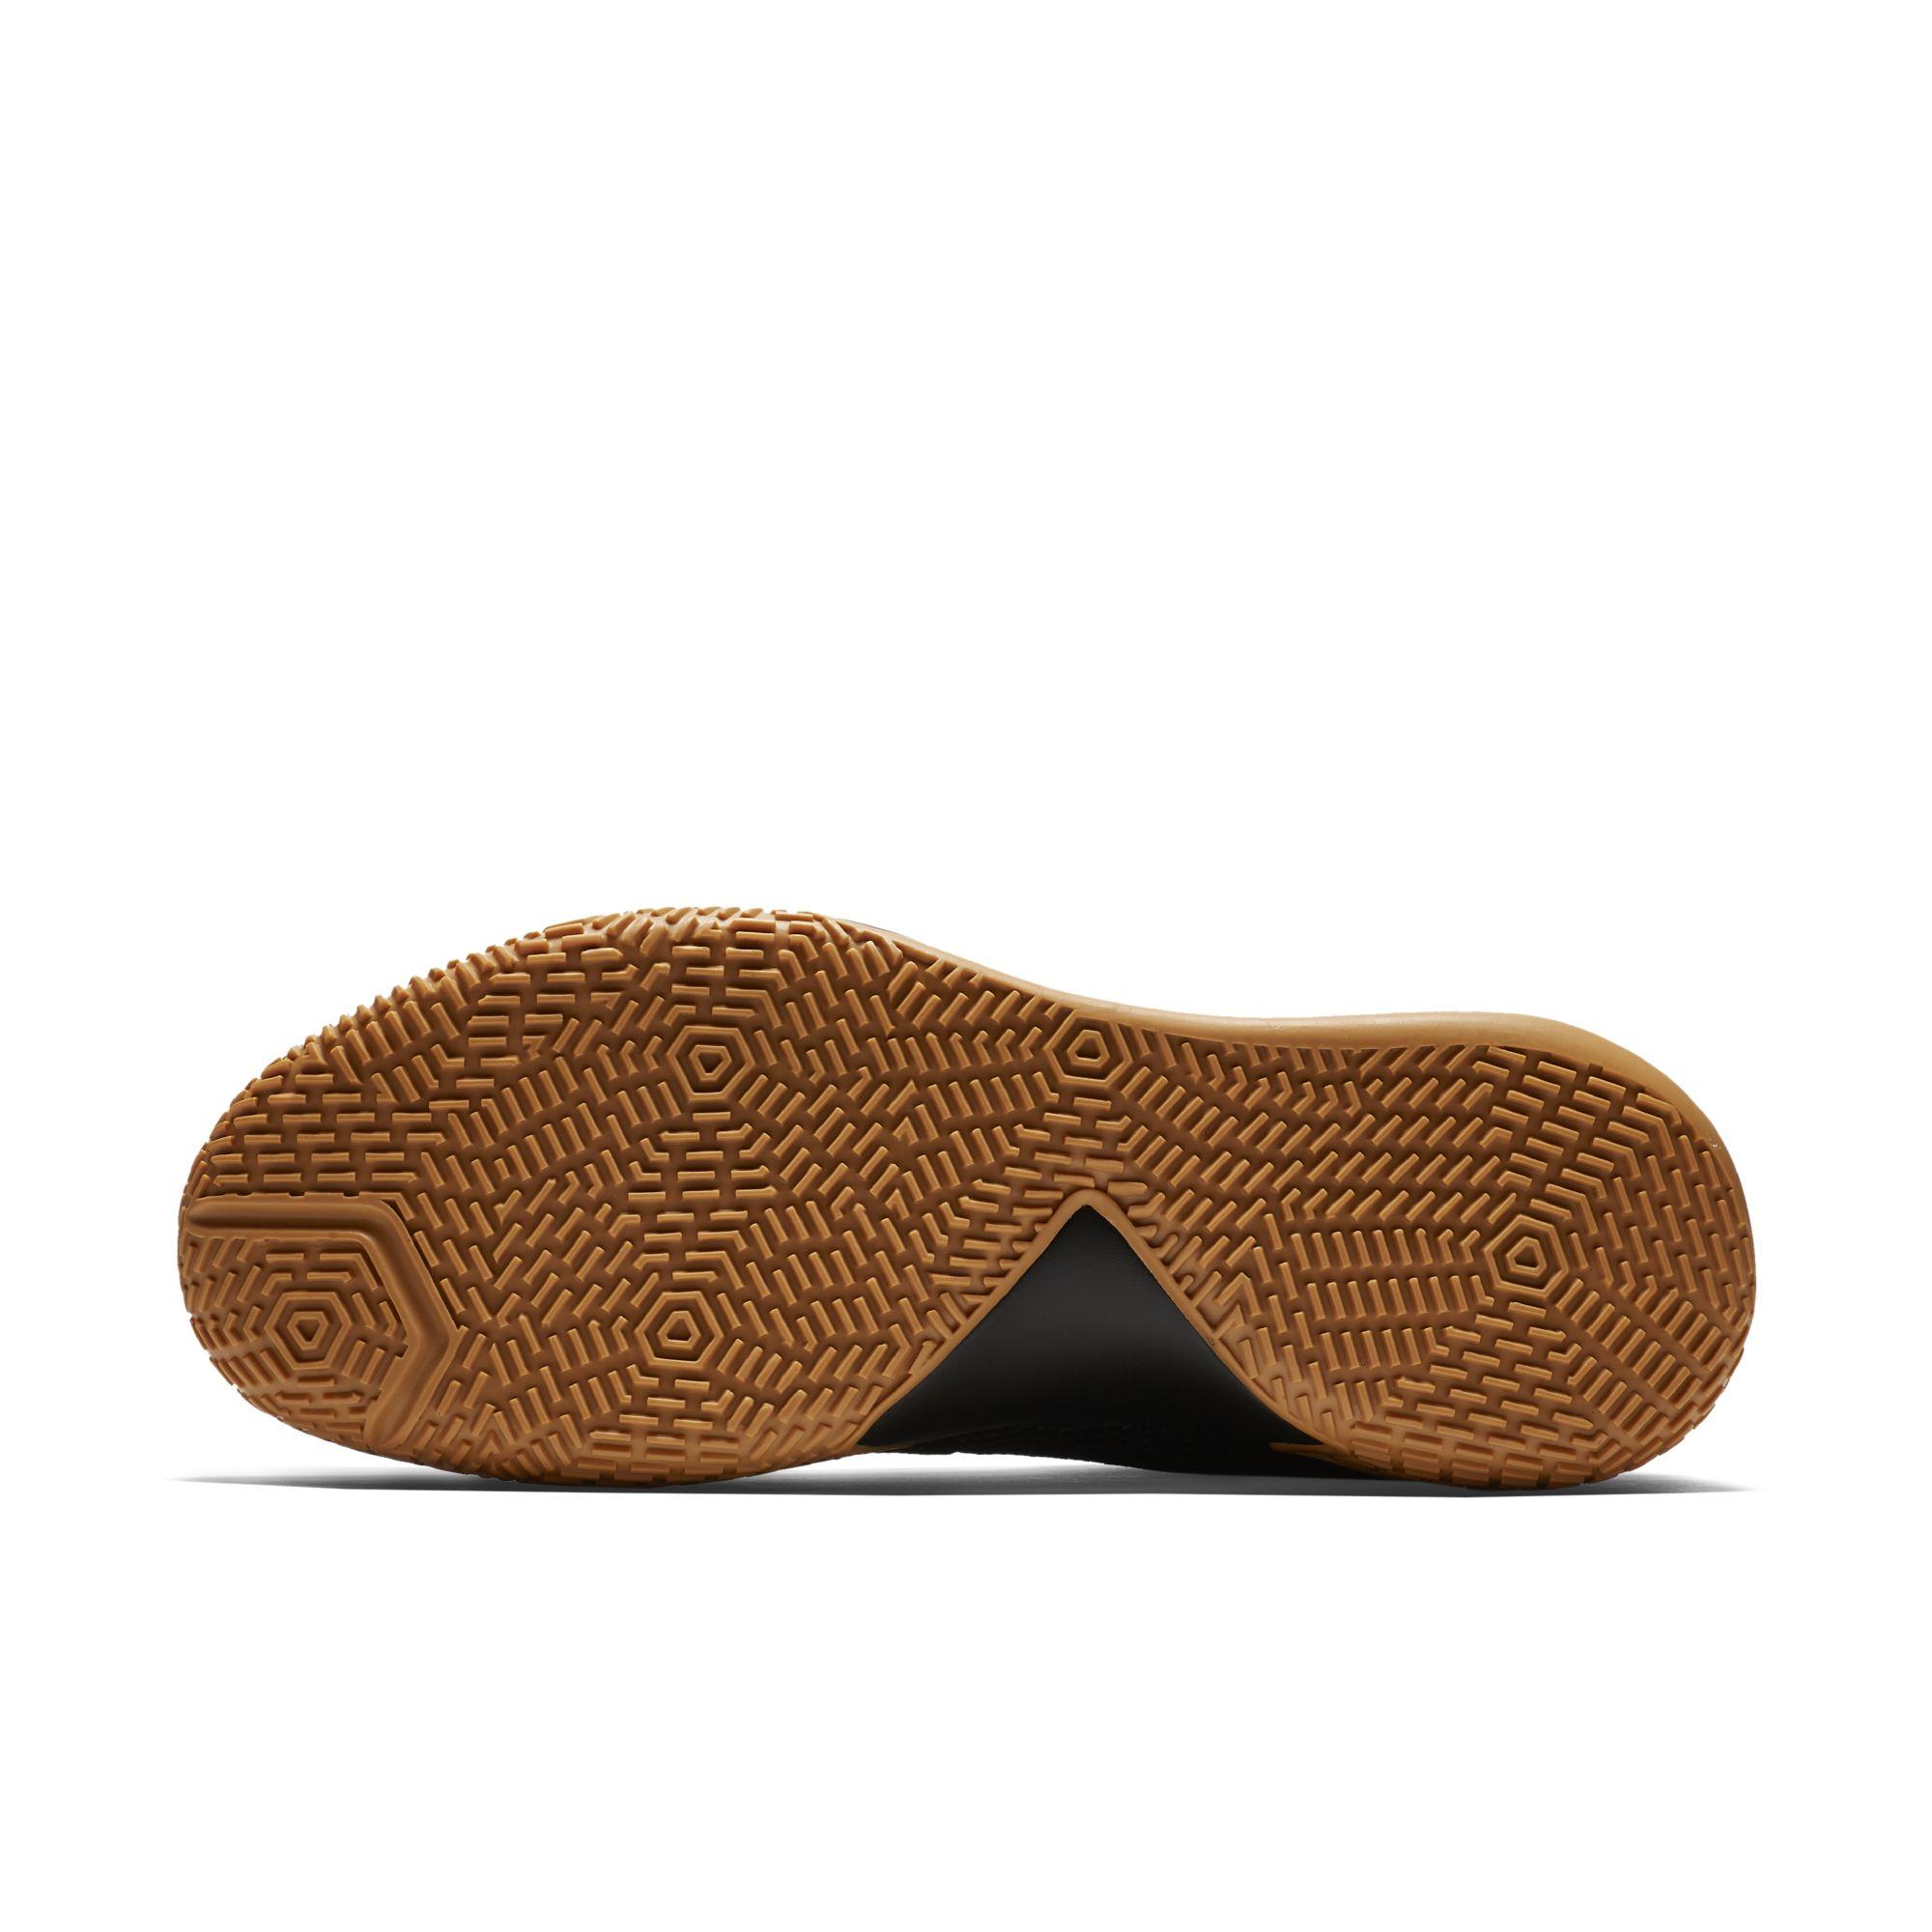 ab822e9f8c13 Nike-Zoom-Live-2-Black-Gum-5 - WearTesters